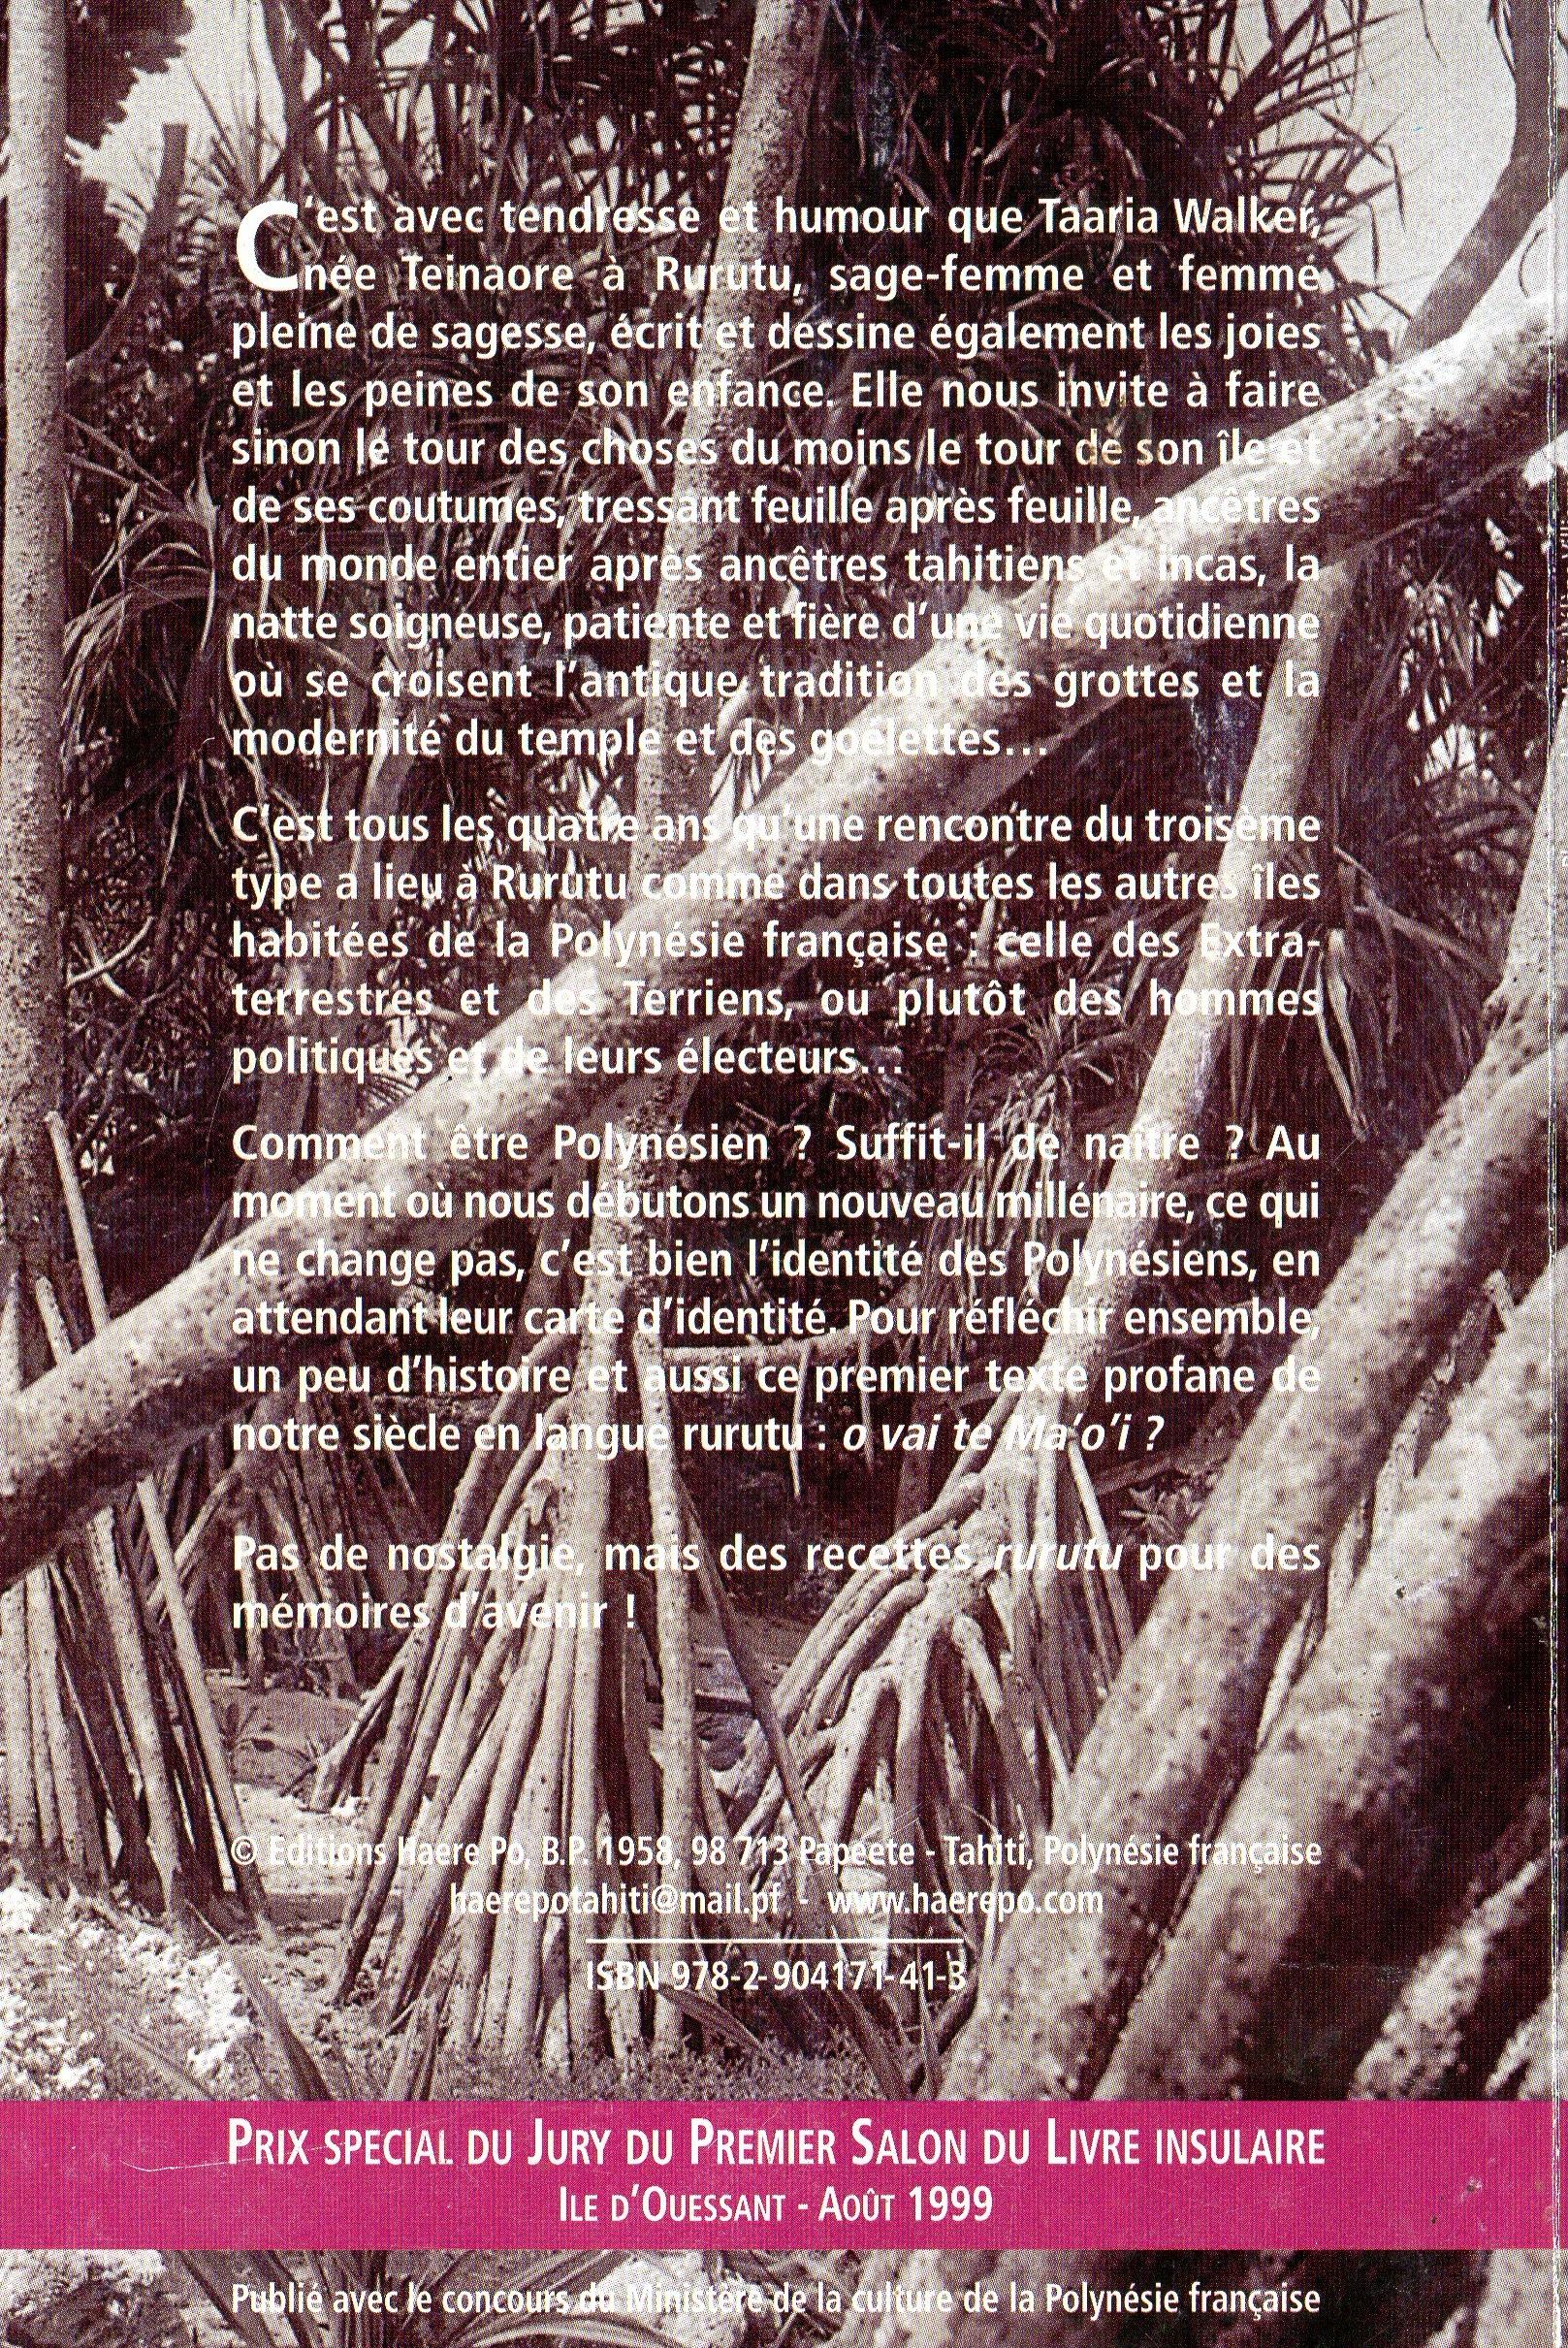 "Taaria Walker, ""la Femme Rurutu porteuse de savoirs"""